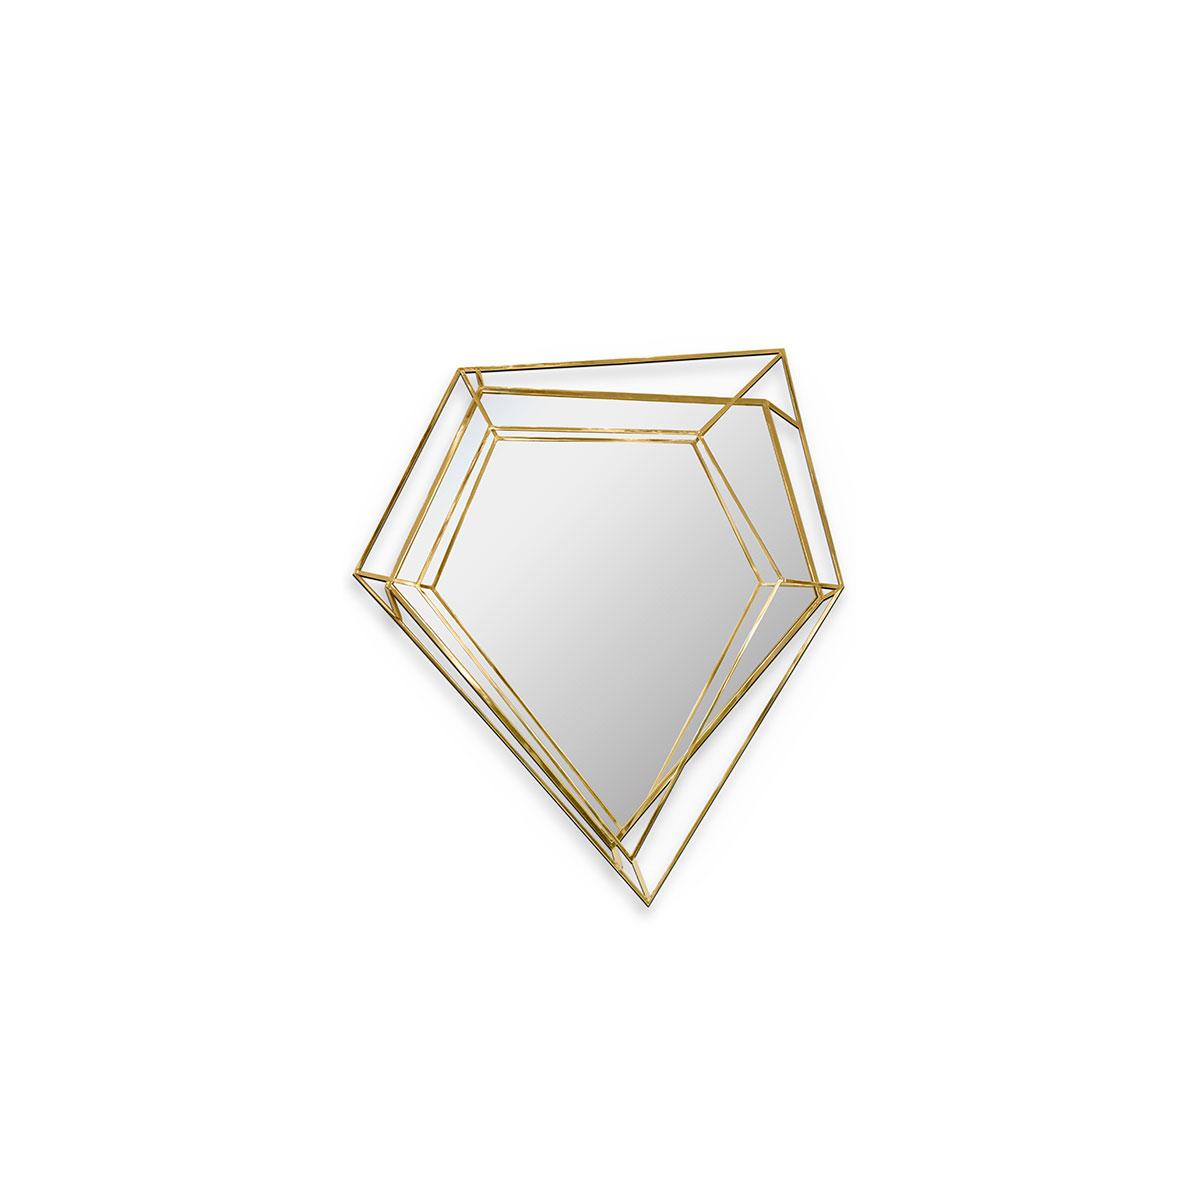 DIAMOND SMALL WALL MIRROR